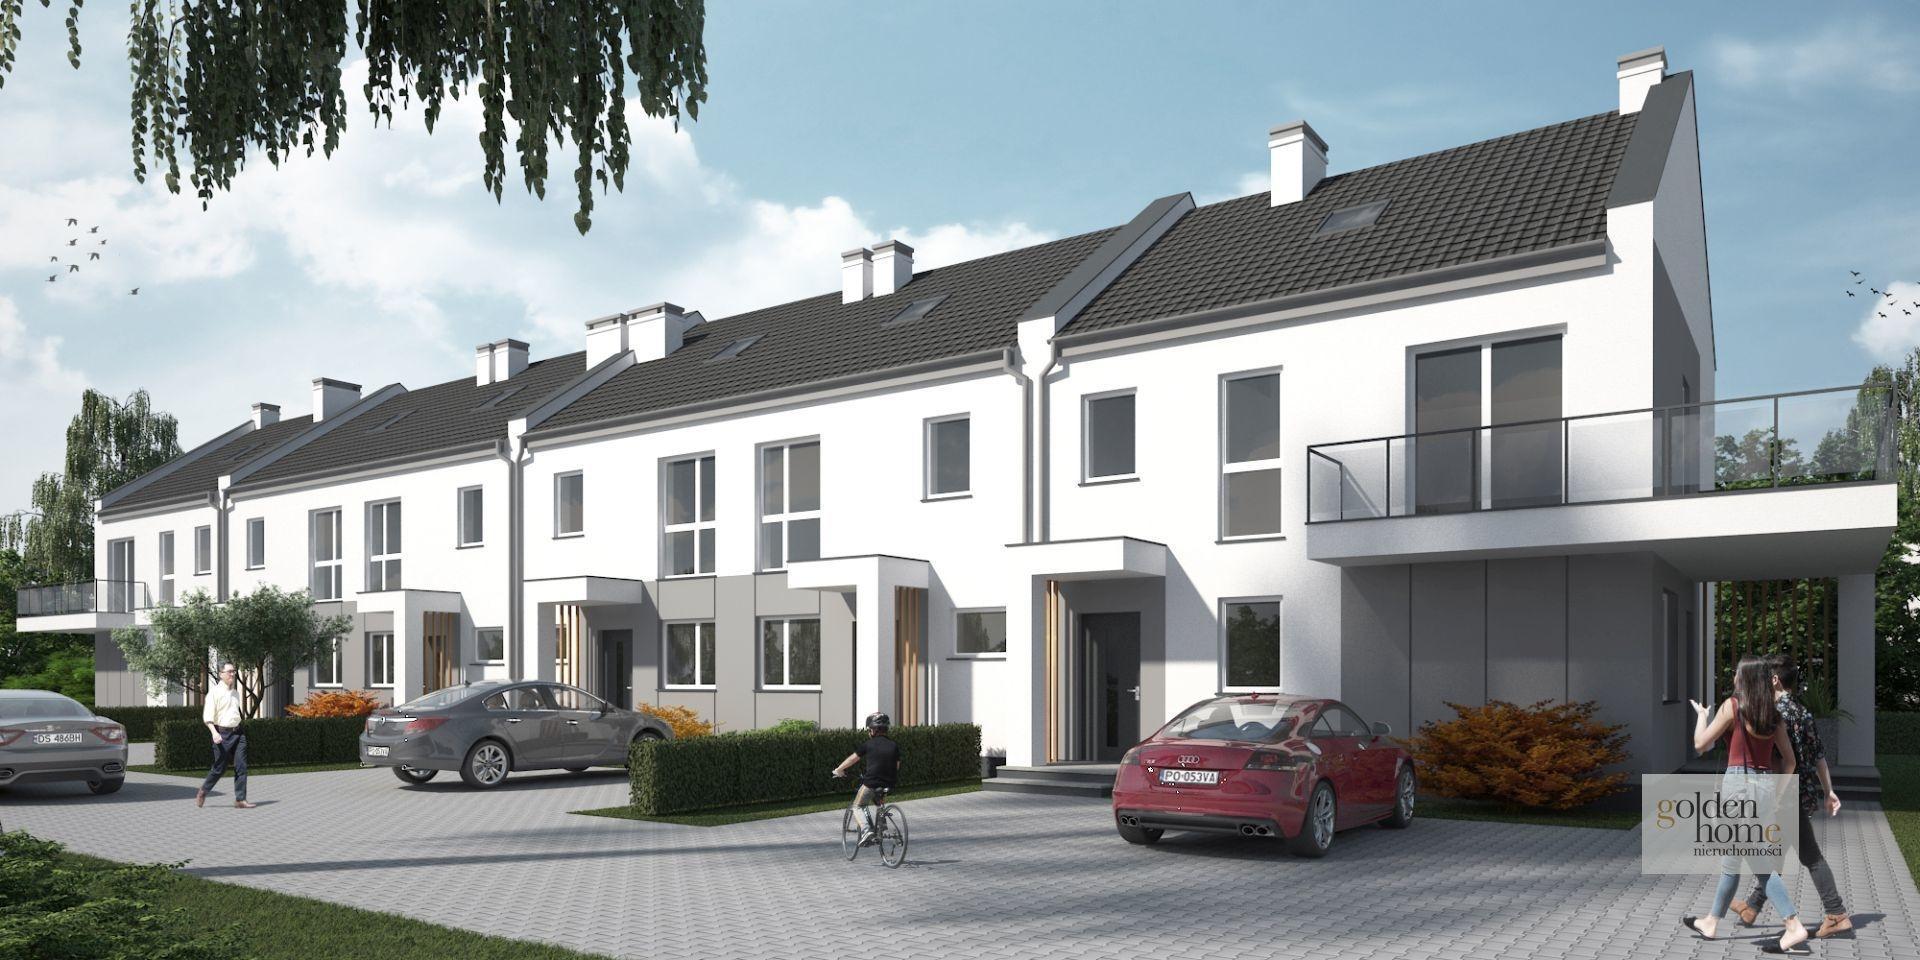 Mieszkanie Plewiska - oferta 4172